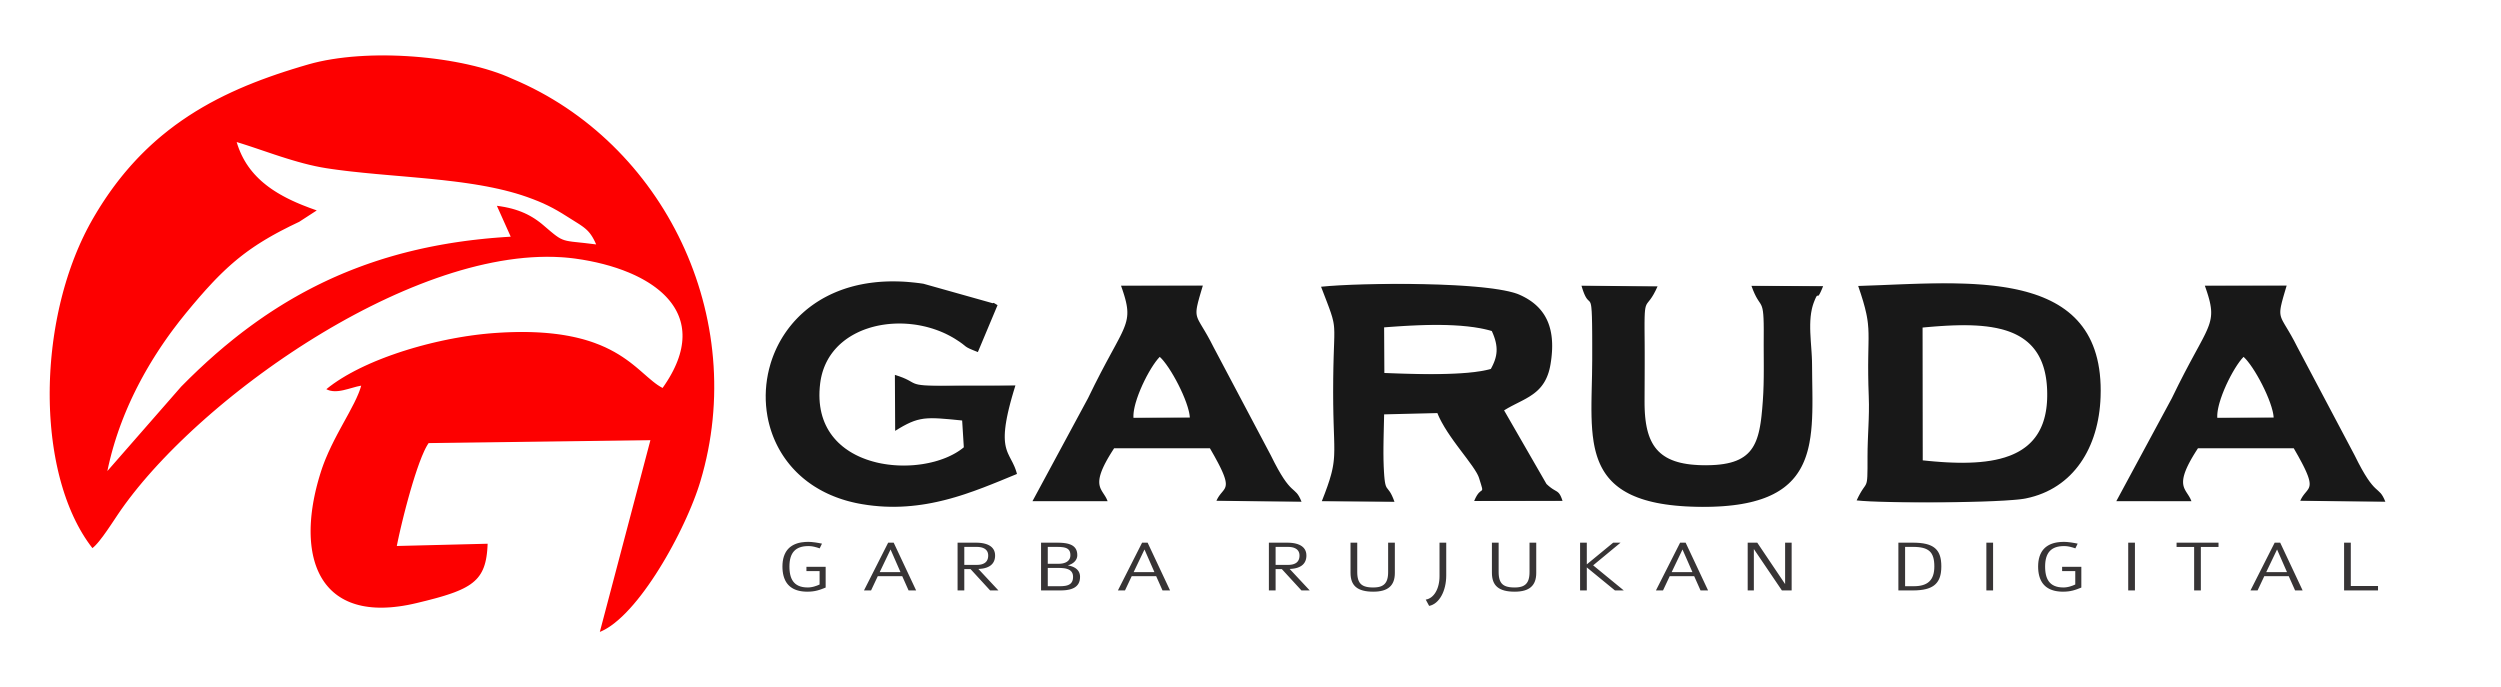 Hasil gambar untuk logo garuda jurnal